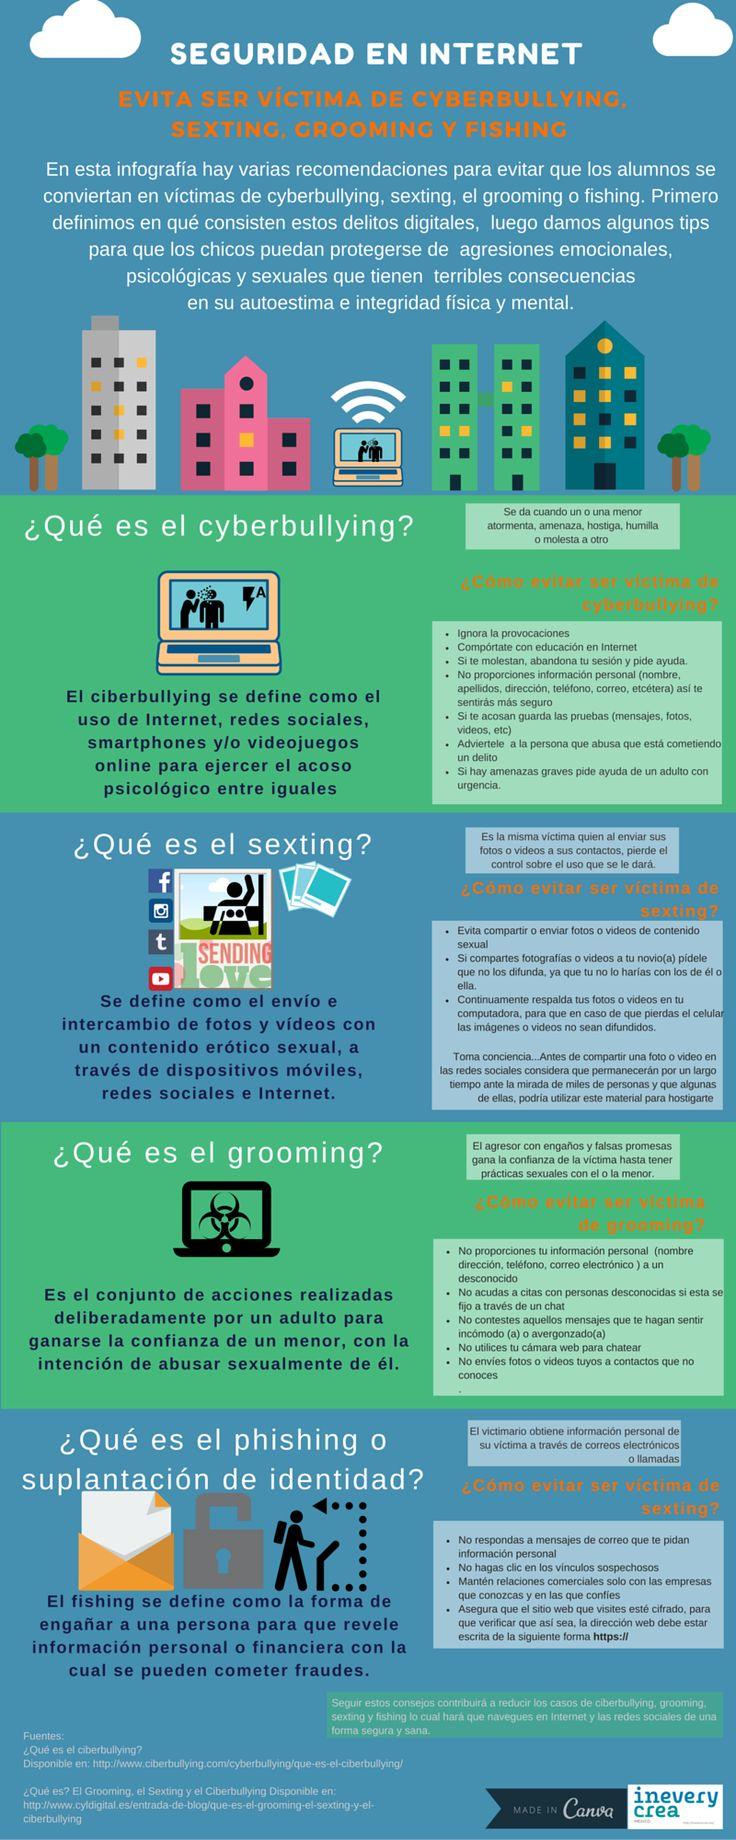 Seguridad en Internet (ciberbullying – sexting – grooming – fishing) #infografia #infographic | TICs y Formación